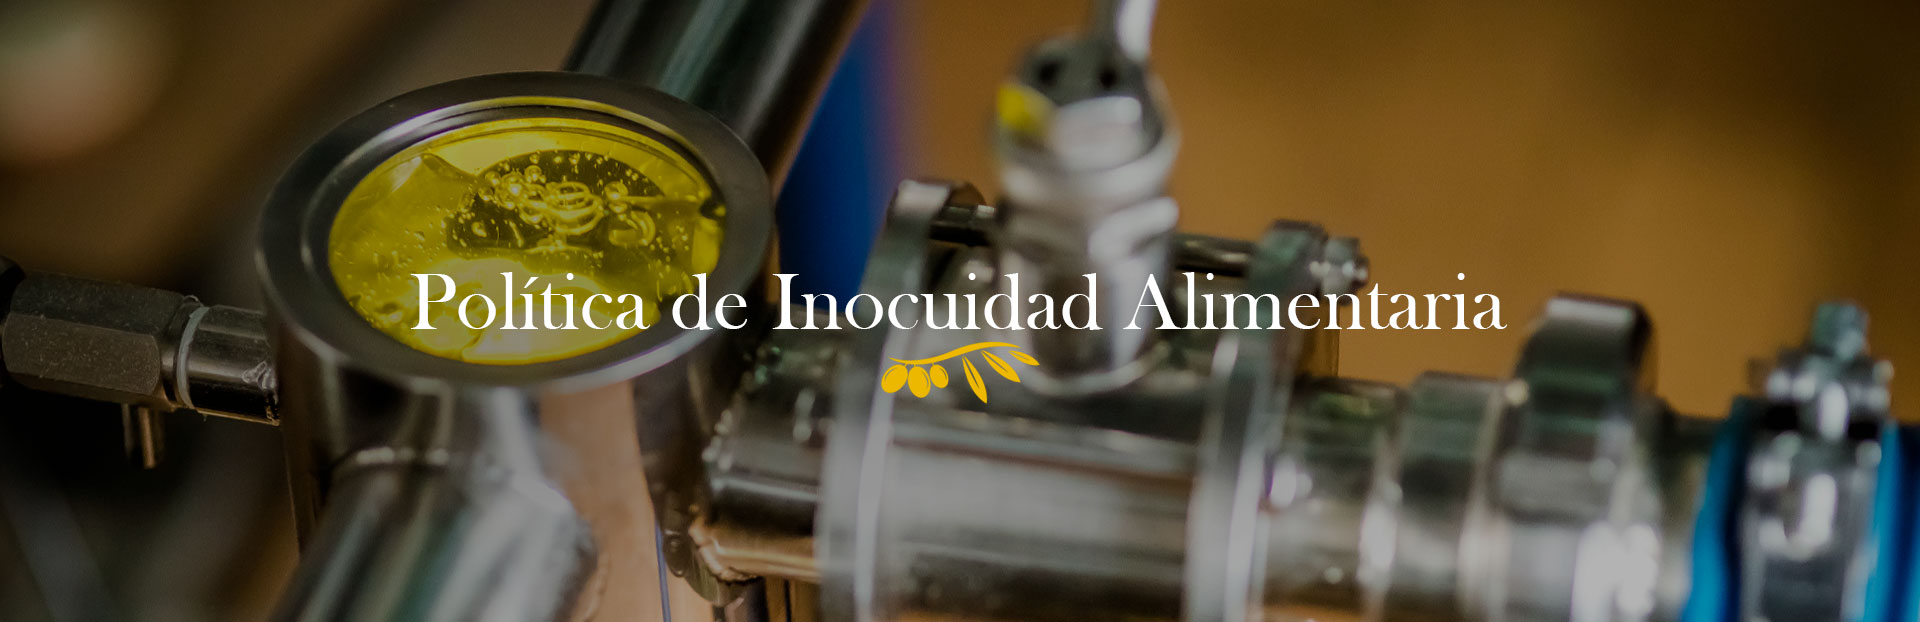 AceitesUnicos_sliderpoliticainocuidad-castellano